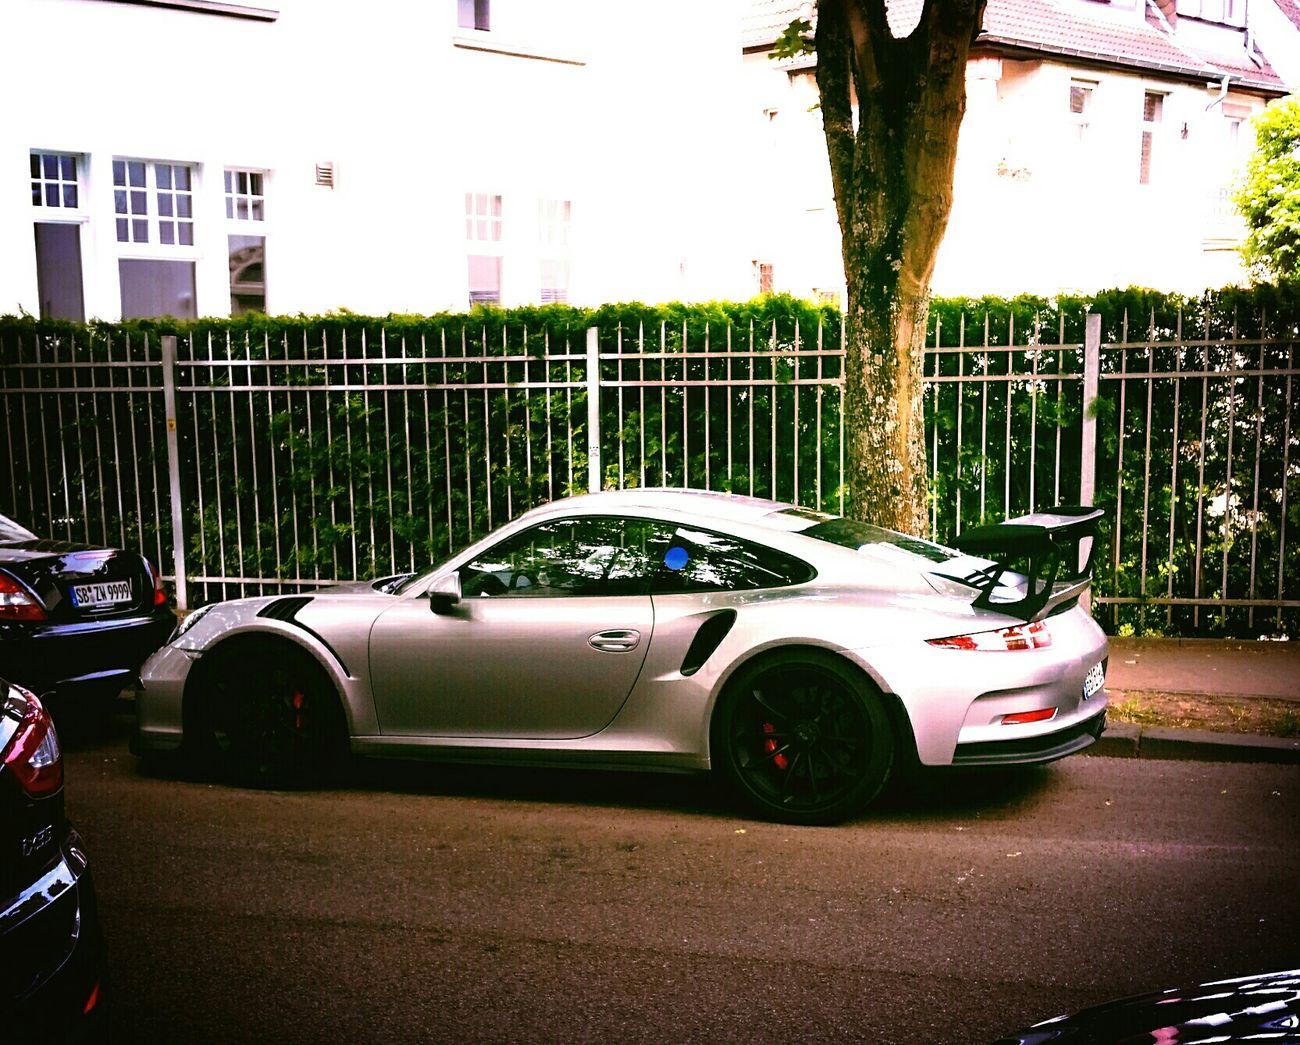 Car Wash car Taking Photos Check This Out Urban Sports Porsche